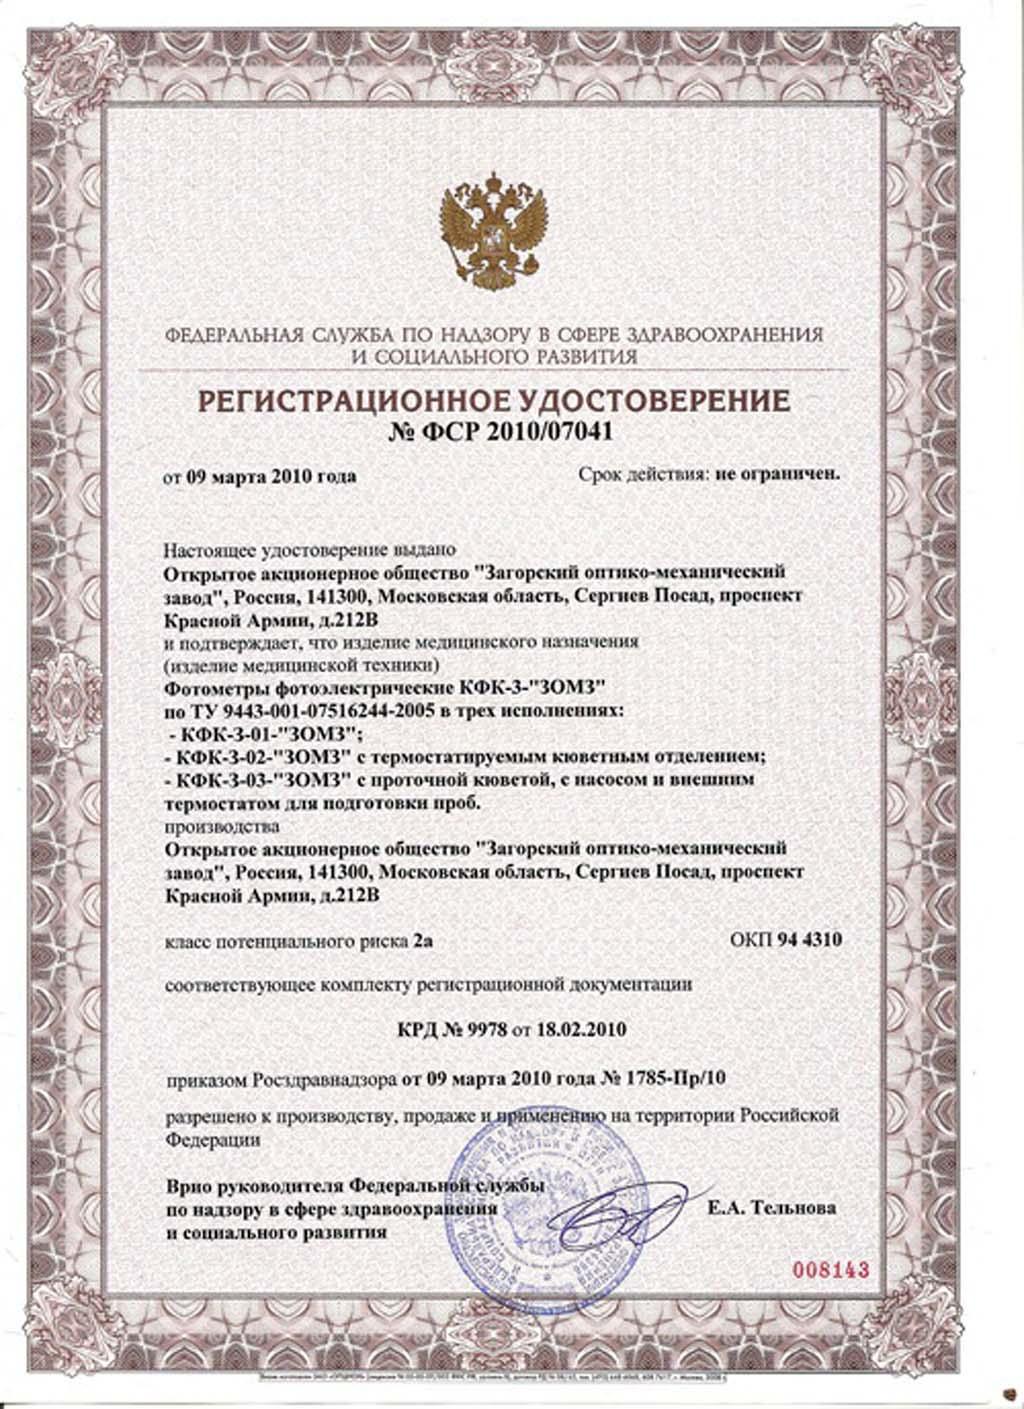 сертификат КФК-3-01 фотометр